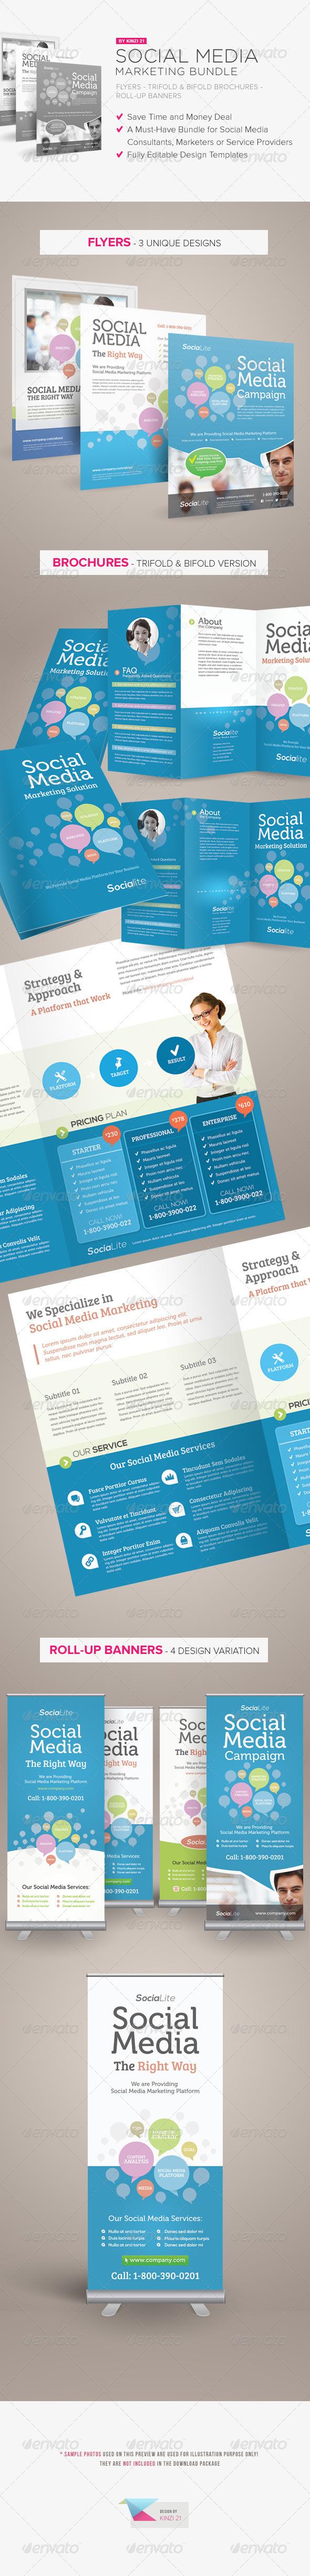 GraphicRiver Social Media Marketing Bundle 5504126